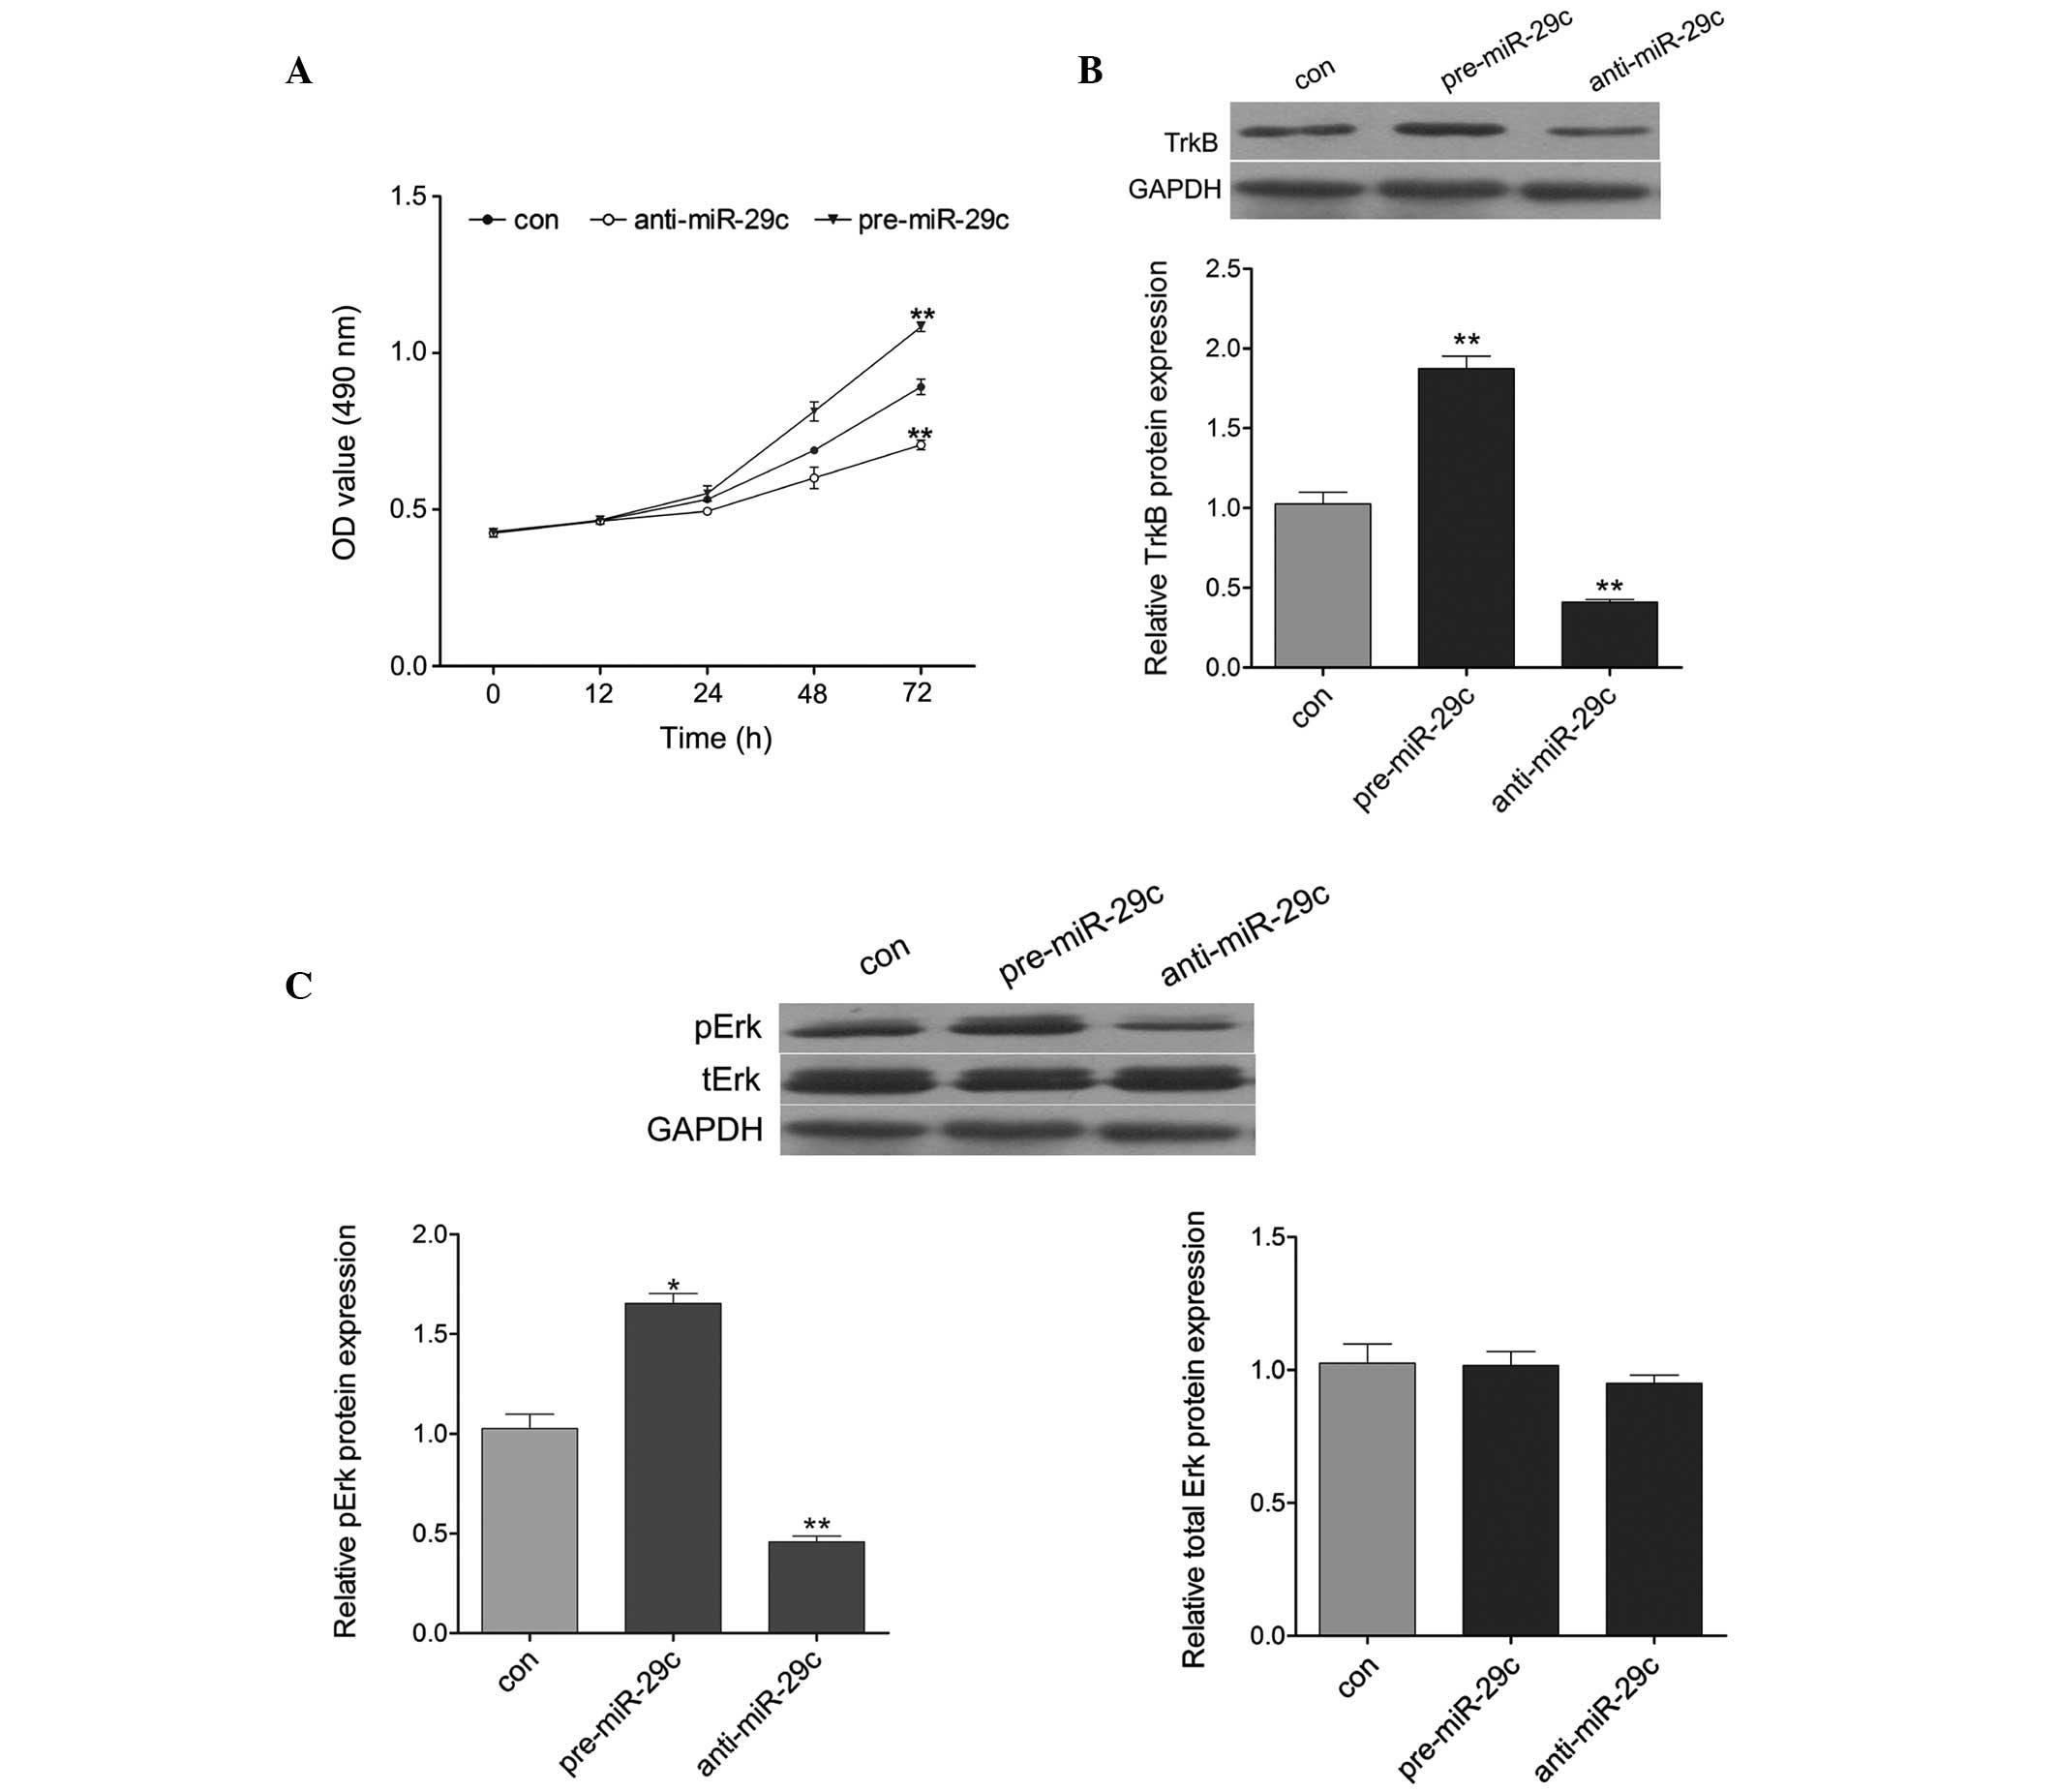 Dysregulated DNA Methyltransferase 3A Upregulates IGFBP5